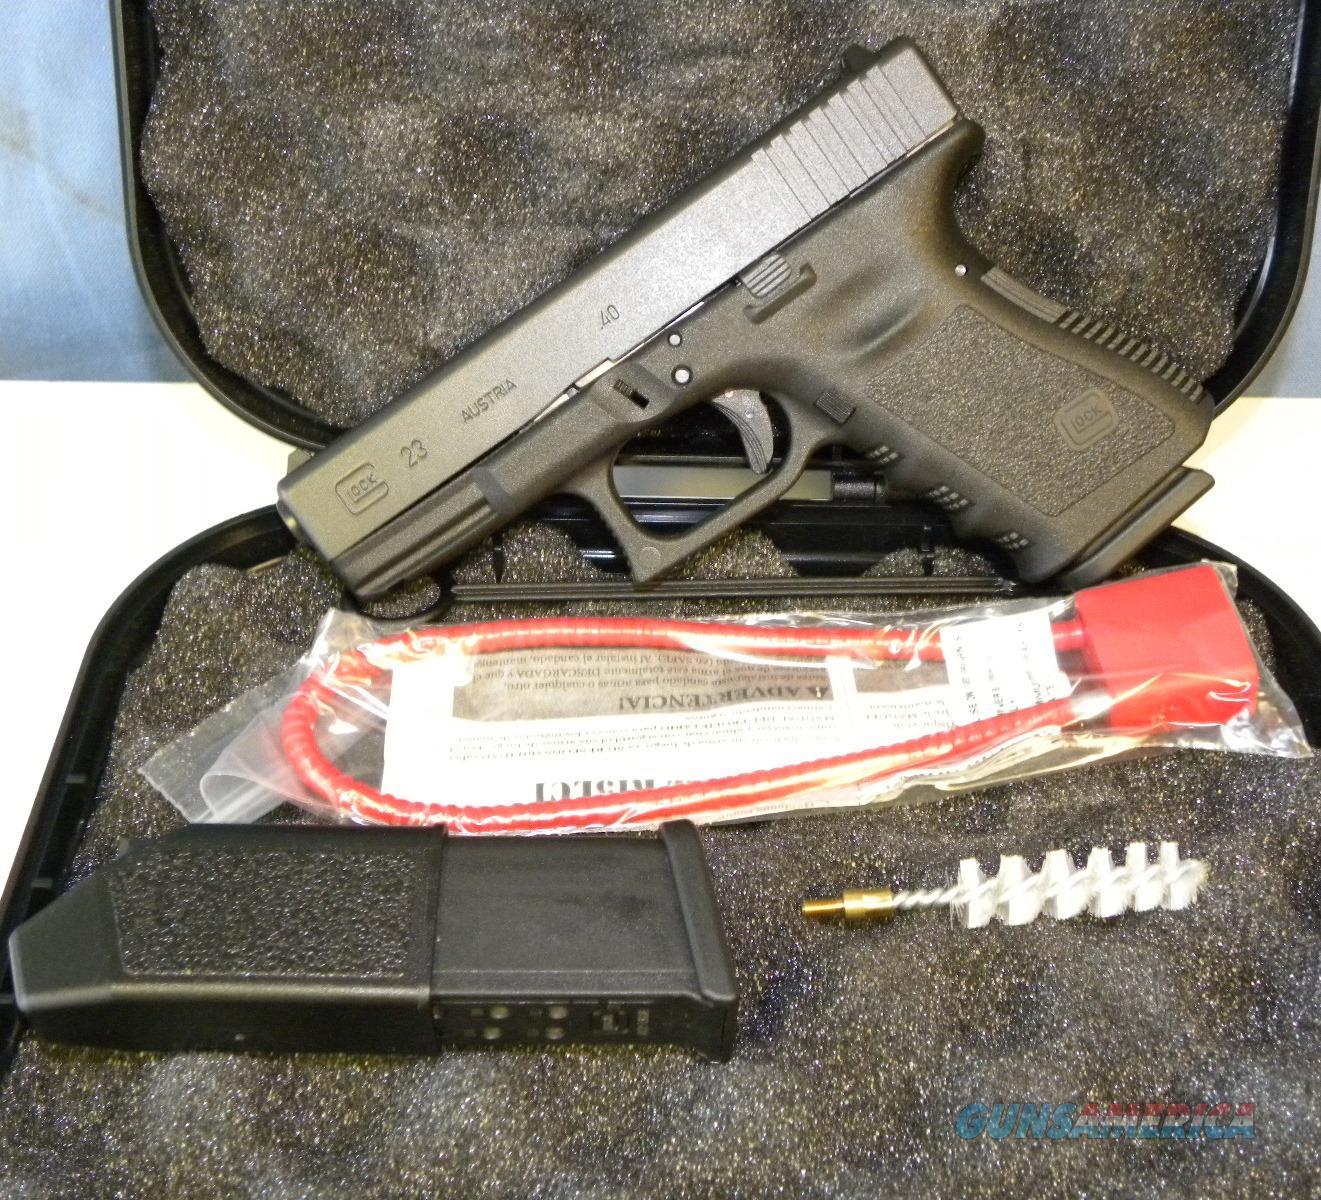 Glock 23 Gen 3  Guns > Pistols > Glock Pistols > 23